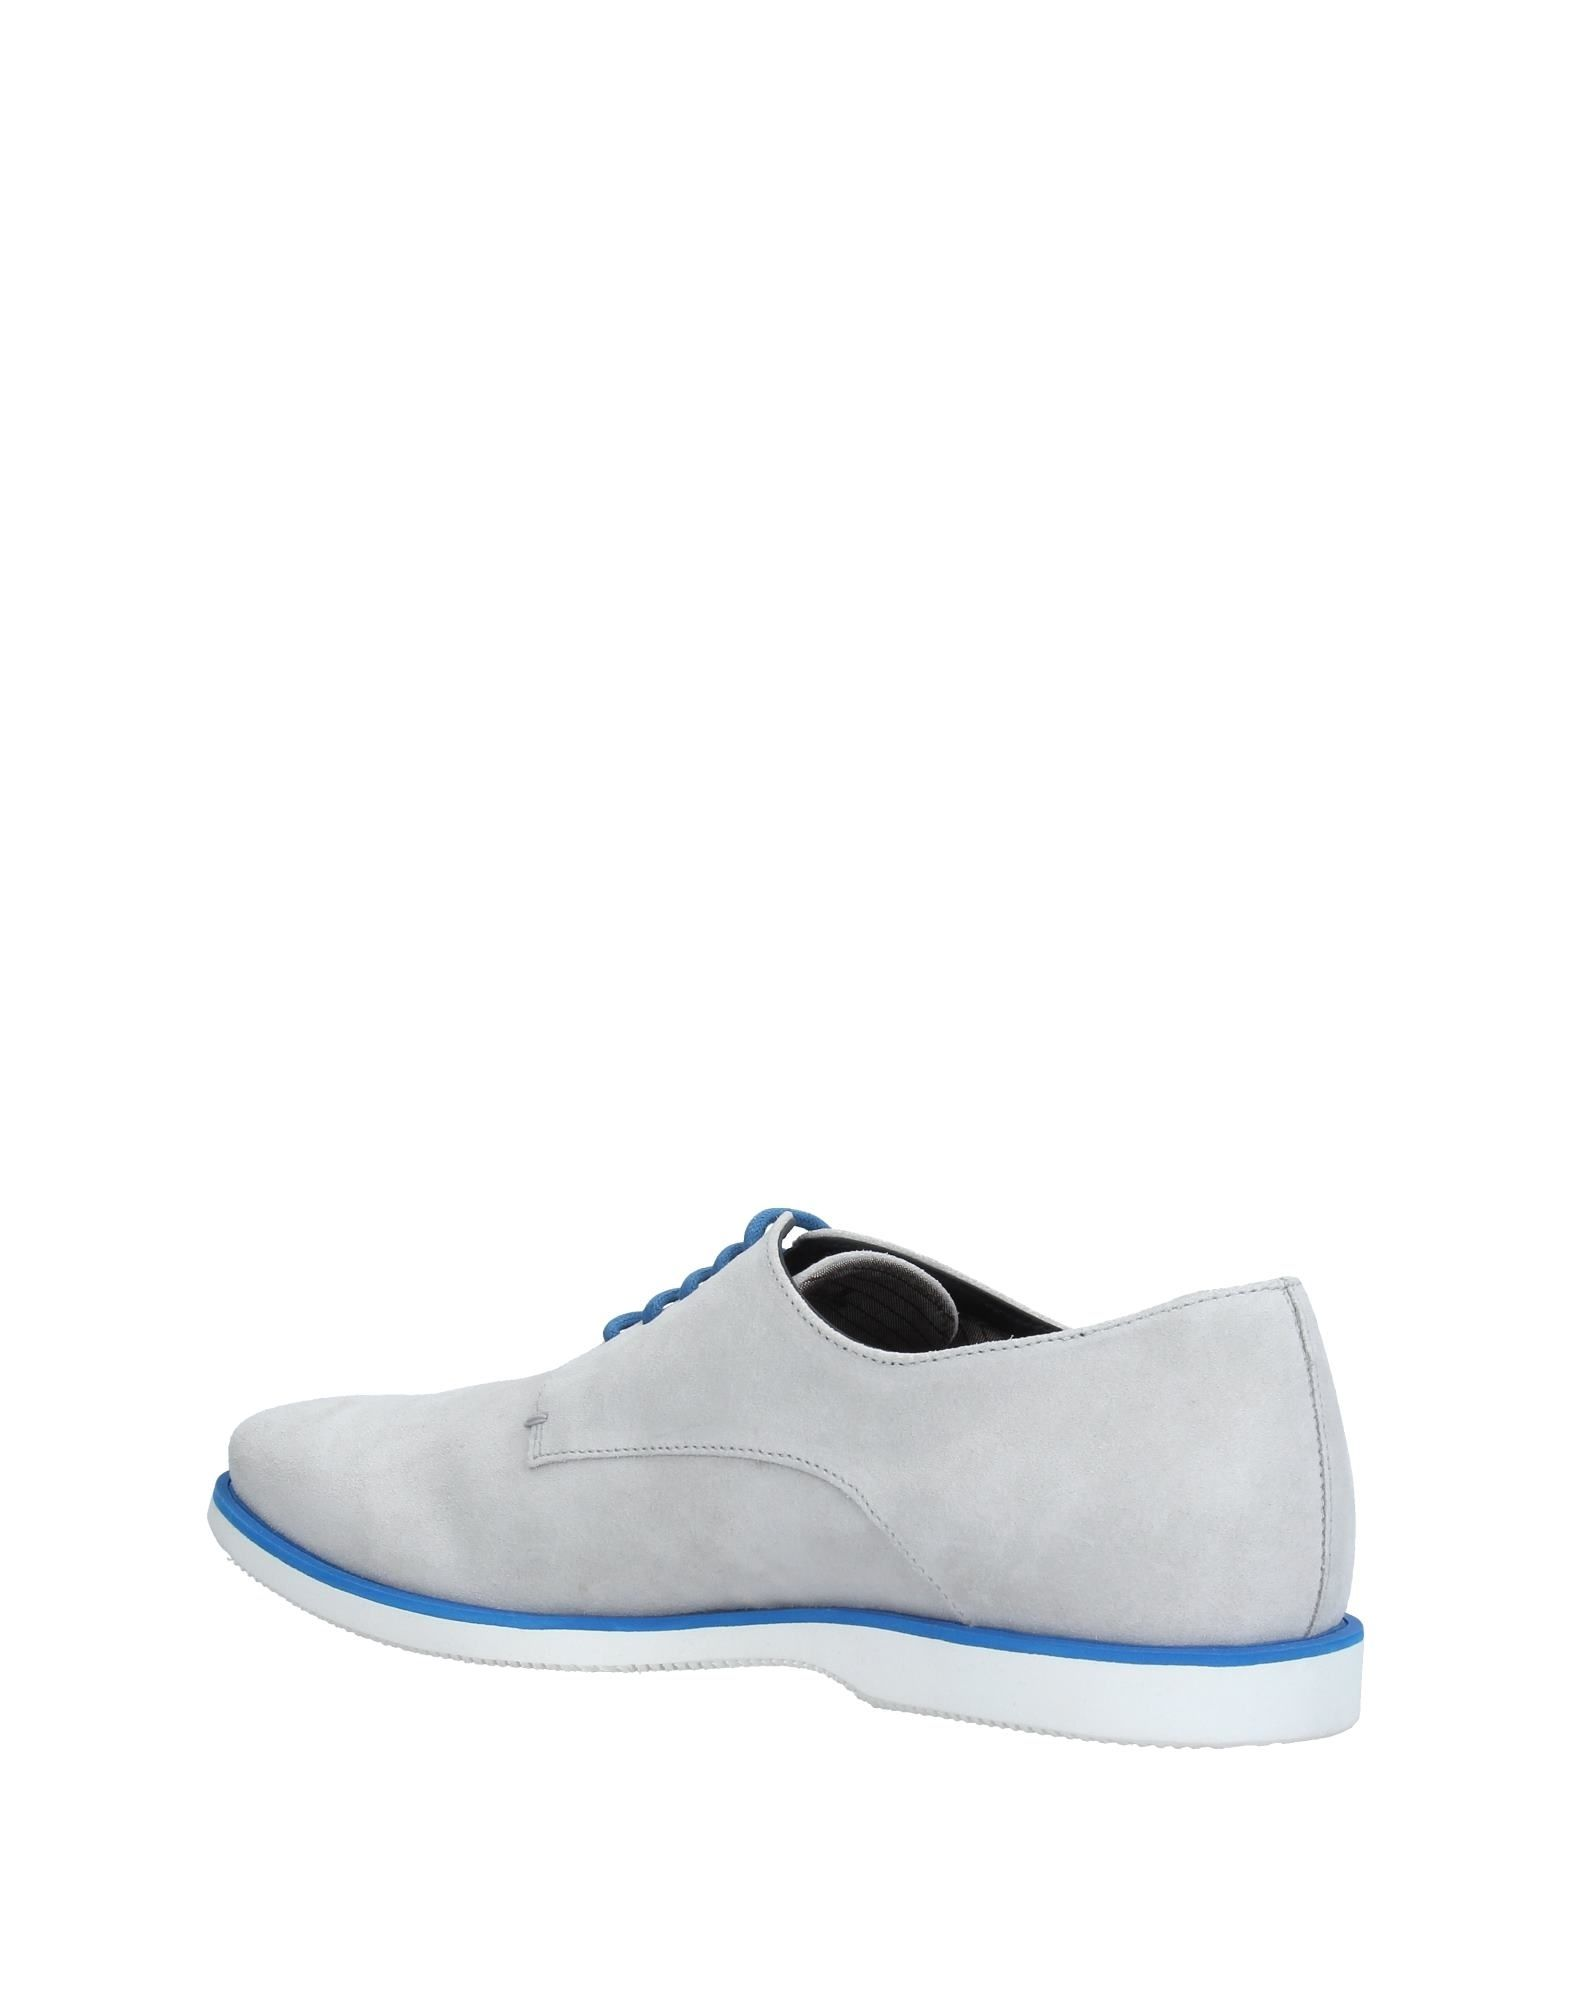 Hogan Schnürschuhe Herren  11231852GL Gute Qualität beliebte Schuhe